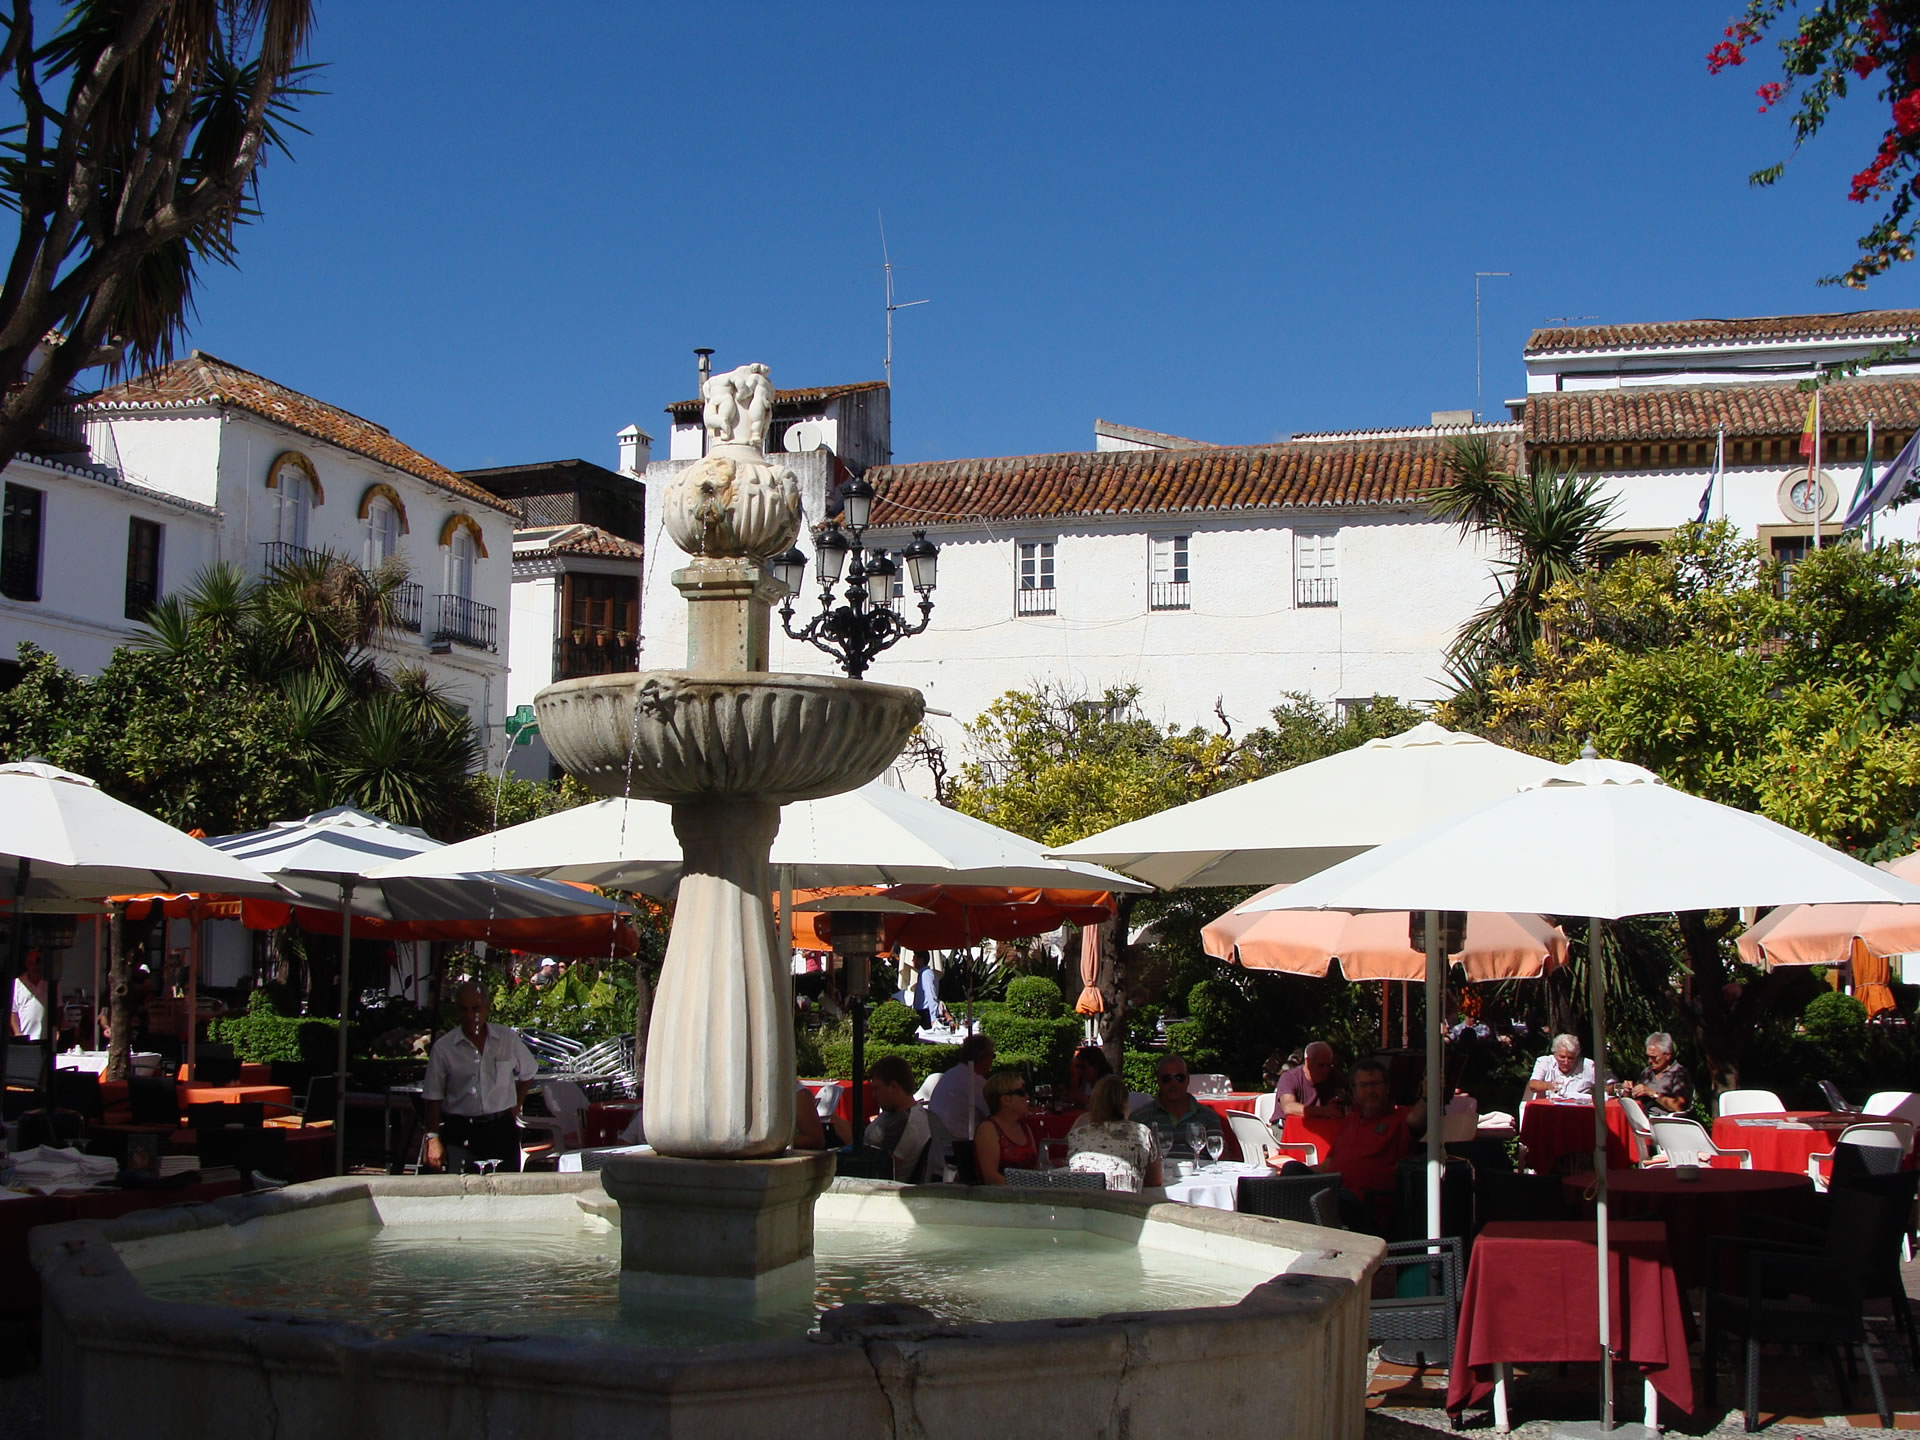 Marbella Old Town - Casco Antiguo